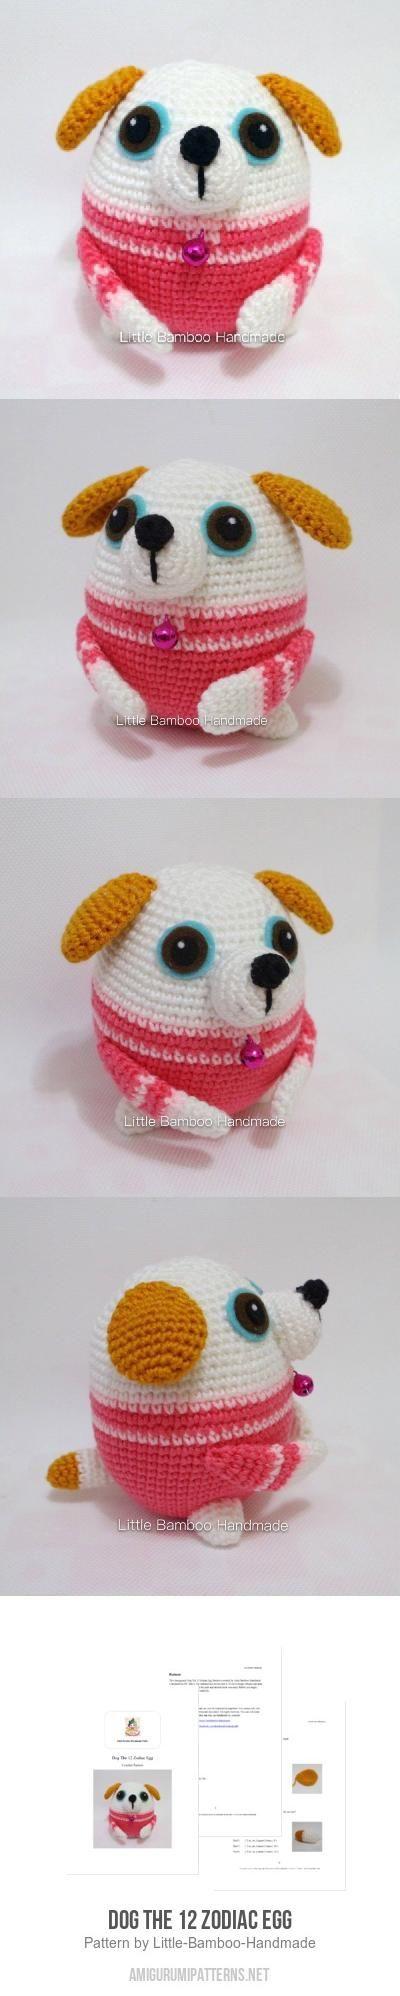 Dog The 12 Zodiac Egg amigurumi pattern